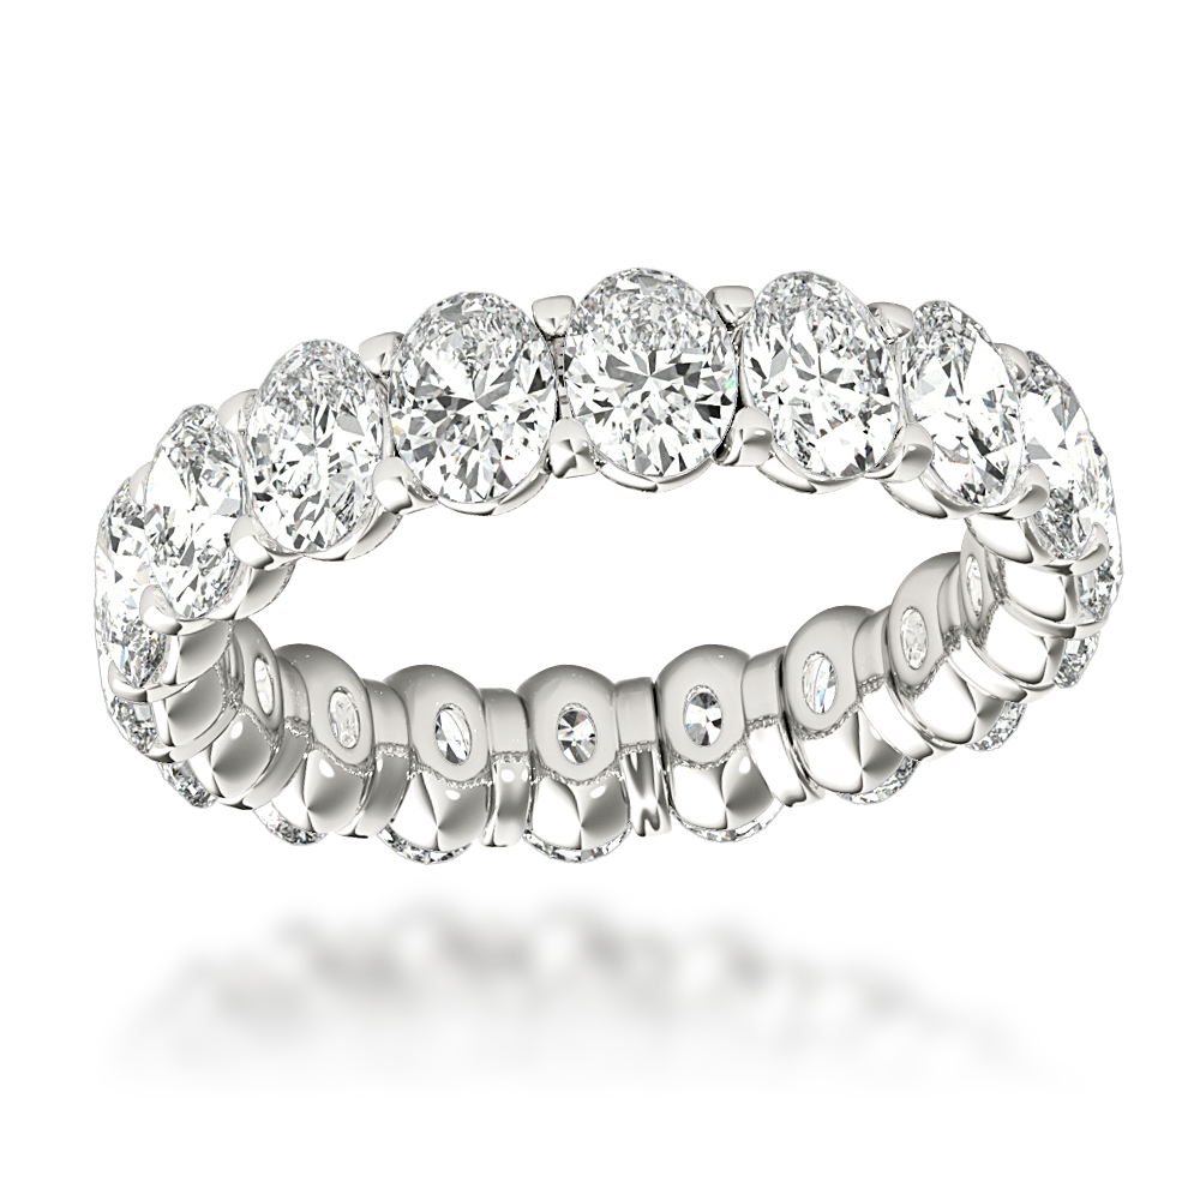 18K Gold Oval Diamond Eternity Ring 4ct G/VS by Luxurman